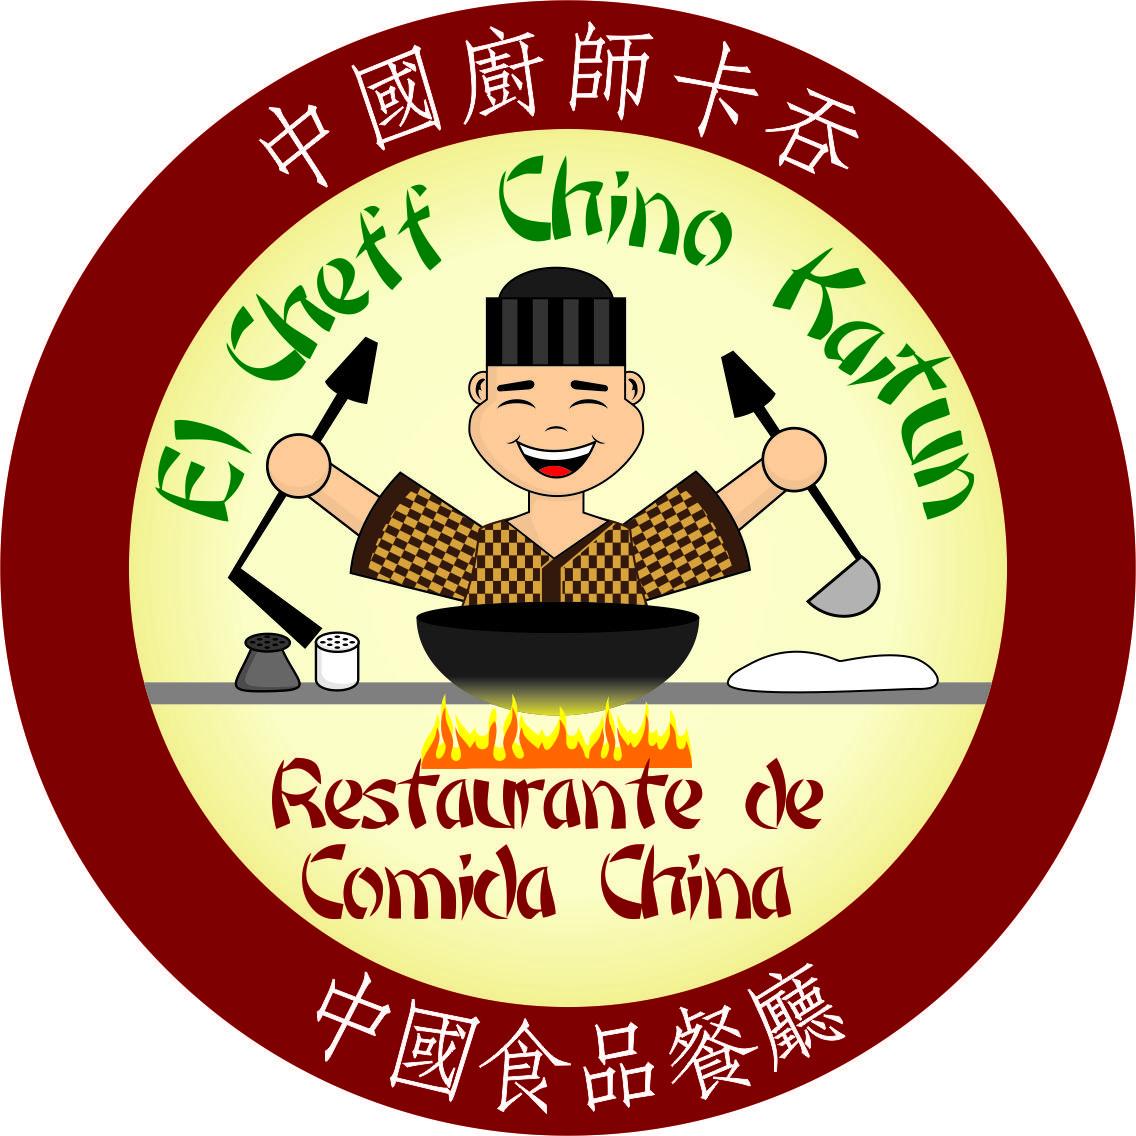 El Chef Kaitun